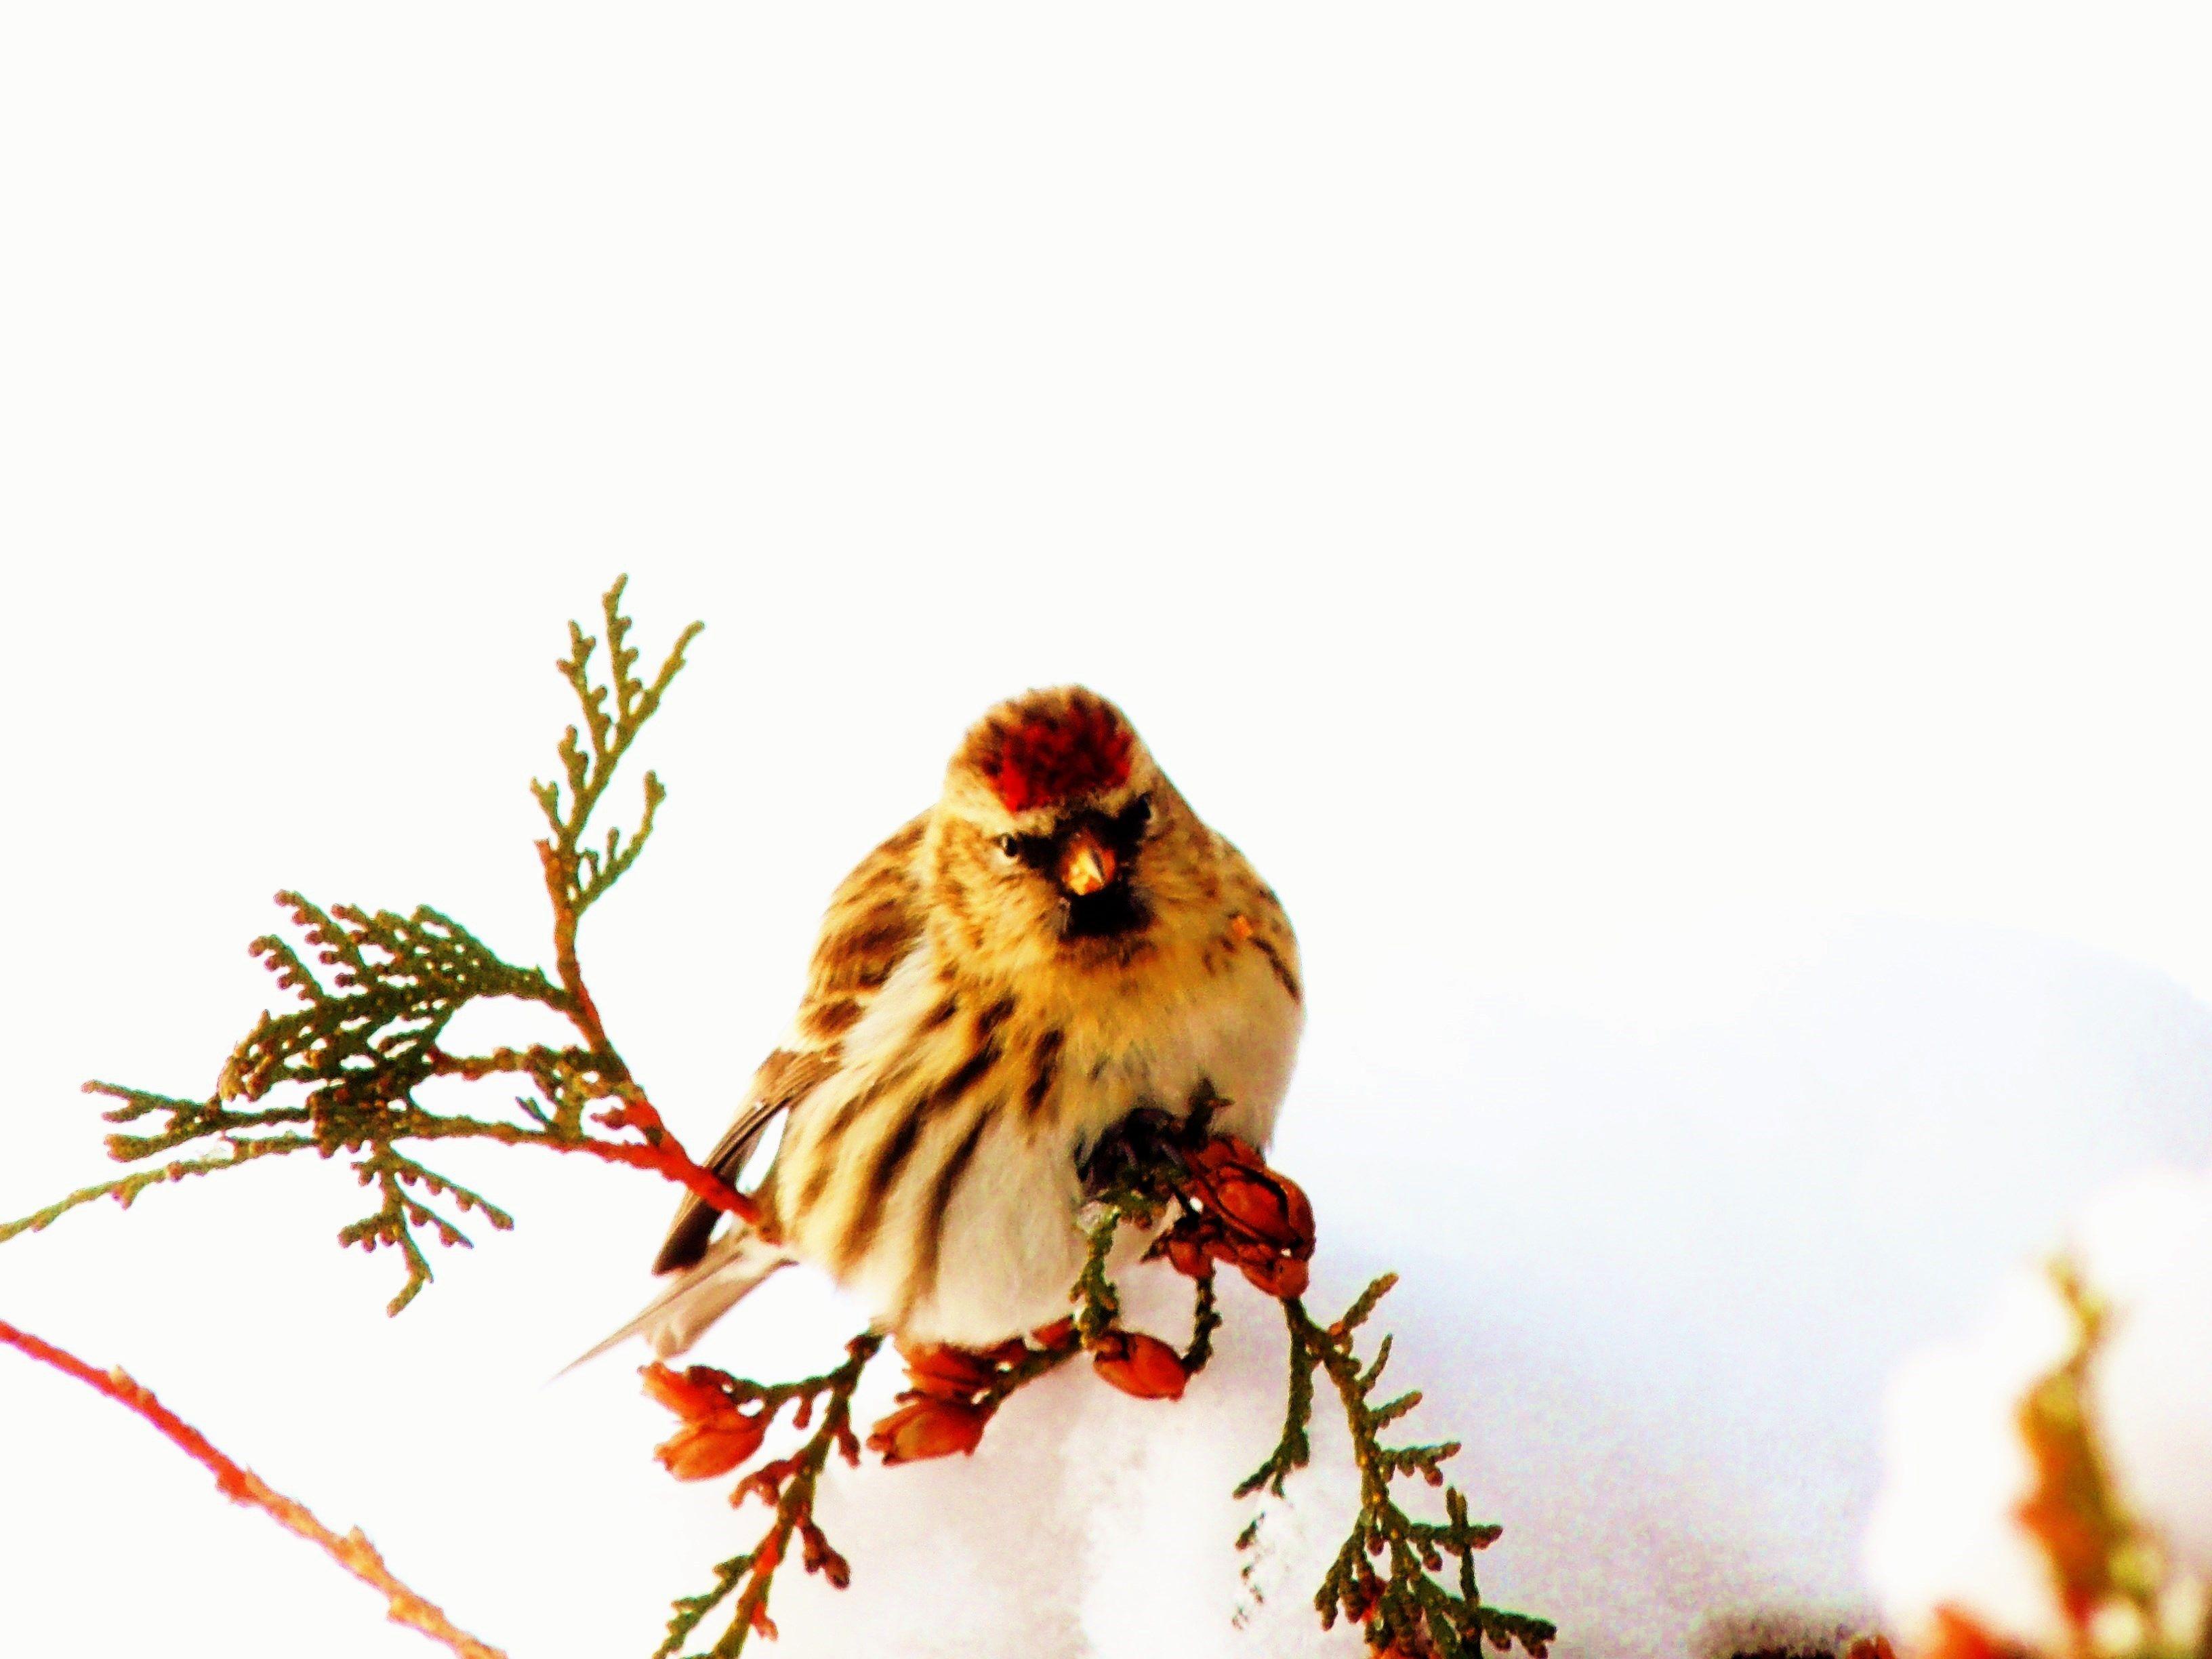 Common Redpoll | Backyard birds, Birds, Animals